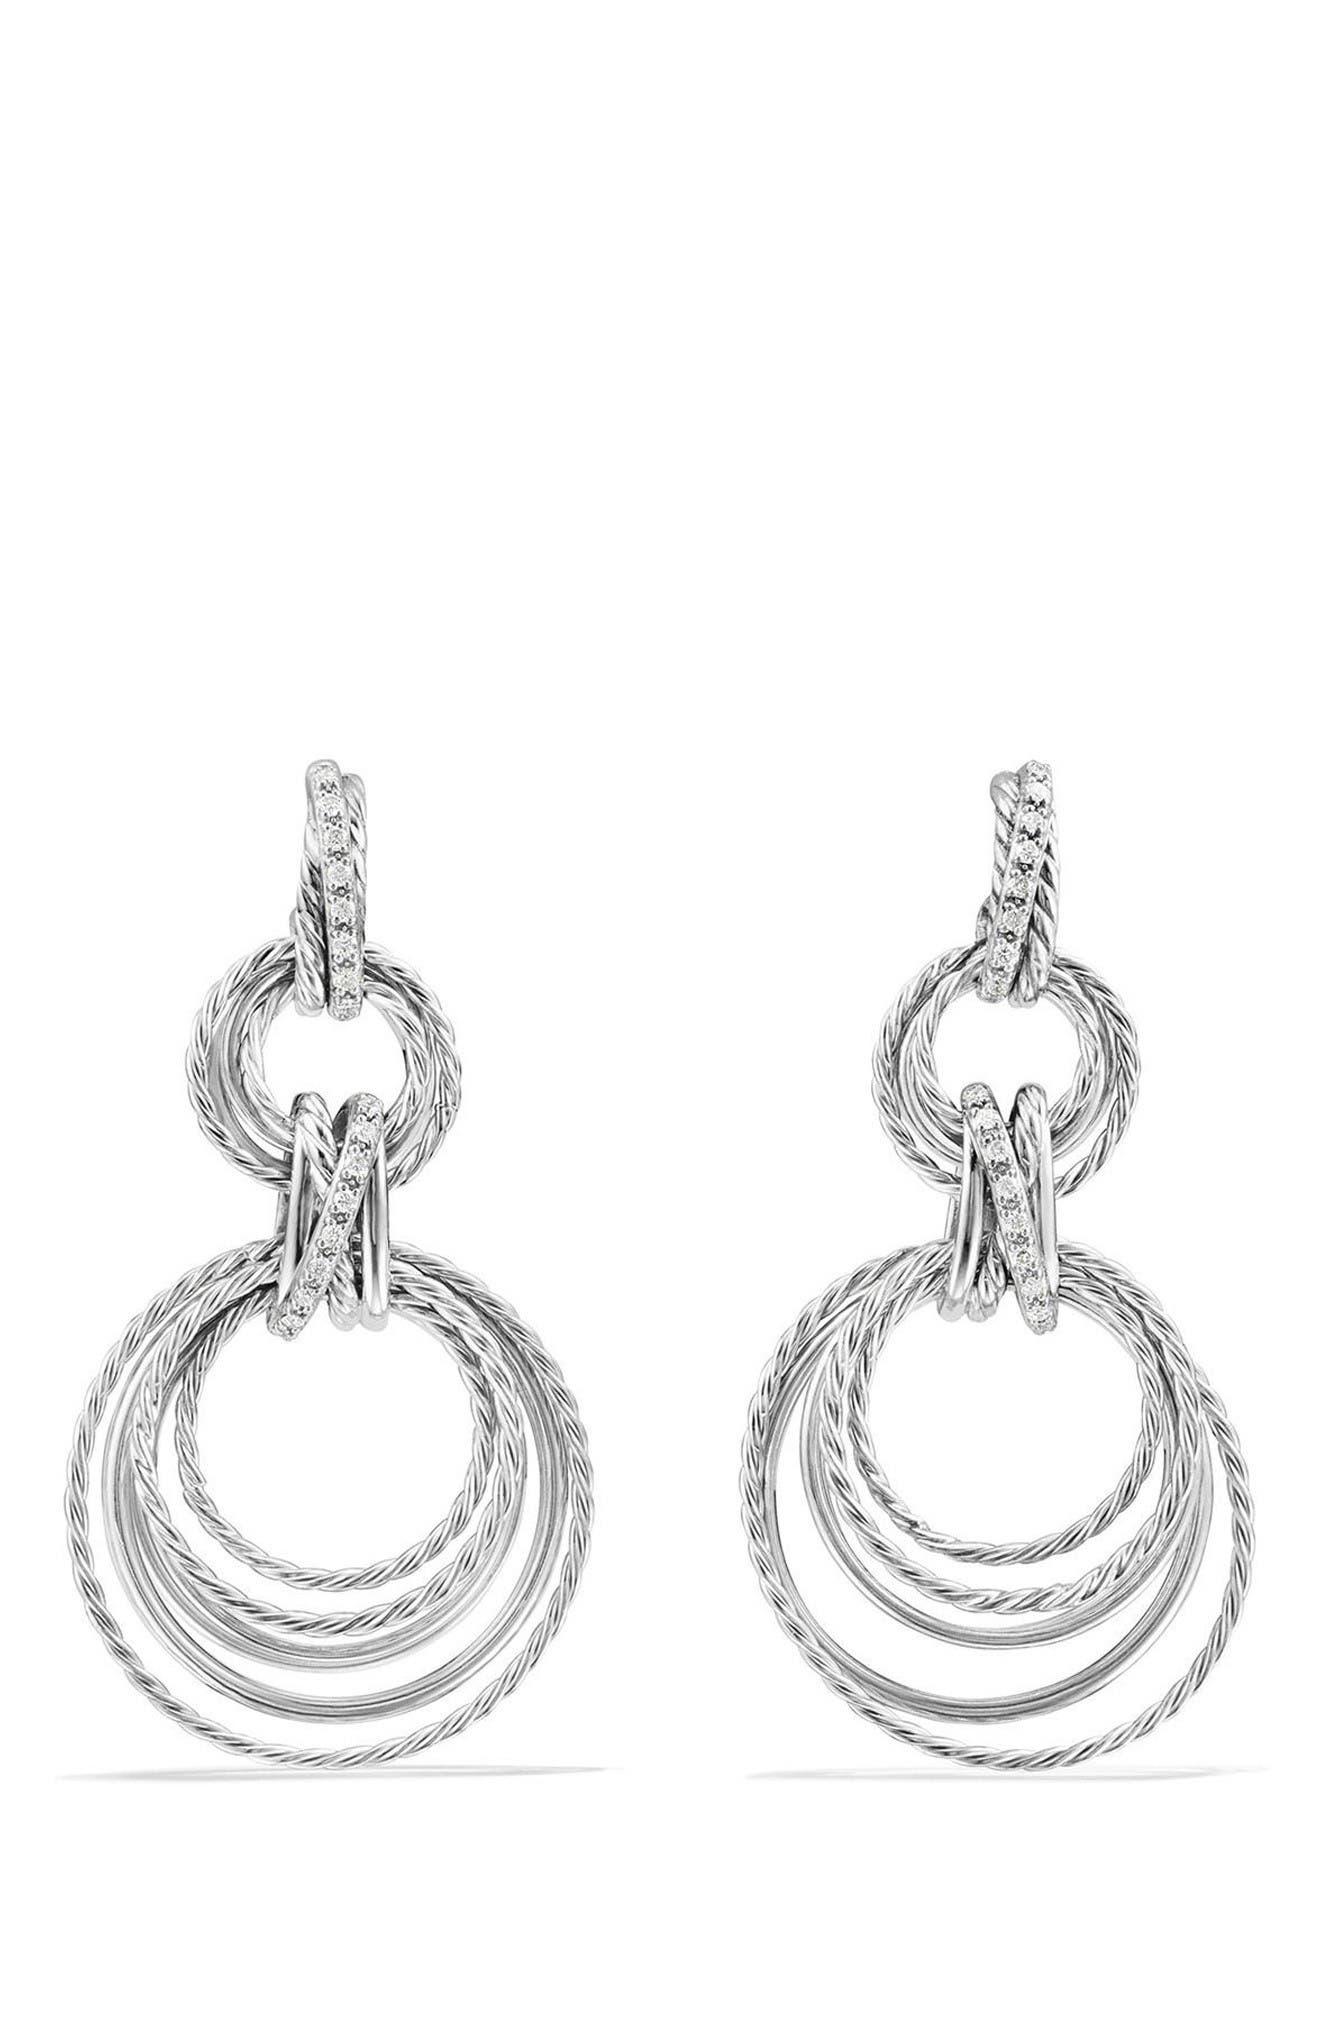 Main Image - David Yurman Crossover Double Drop Earrings with Diamonds